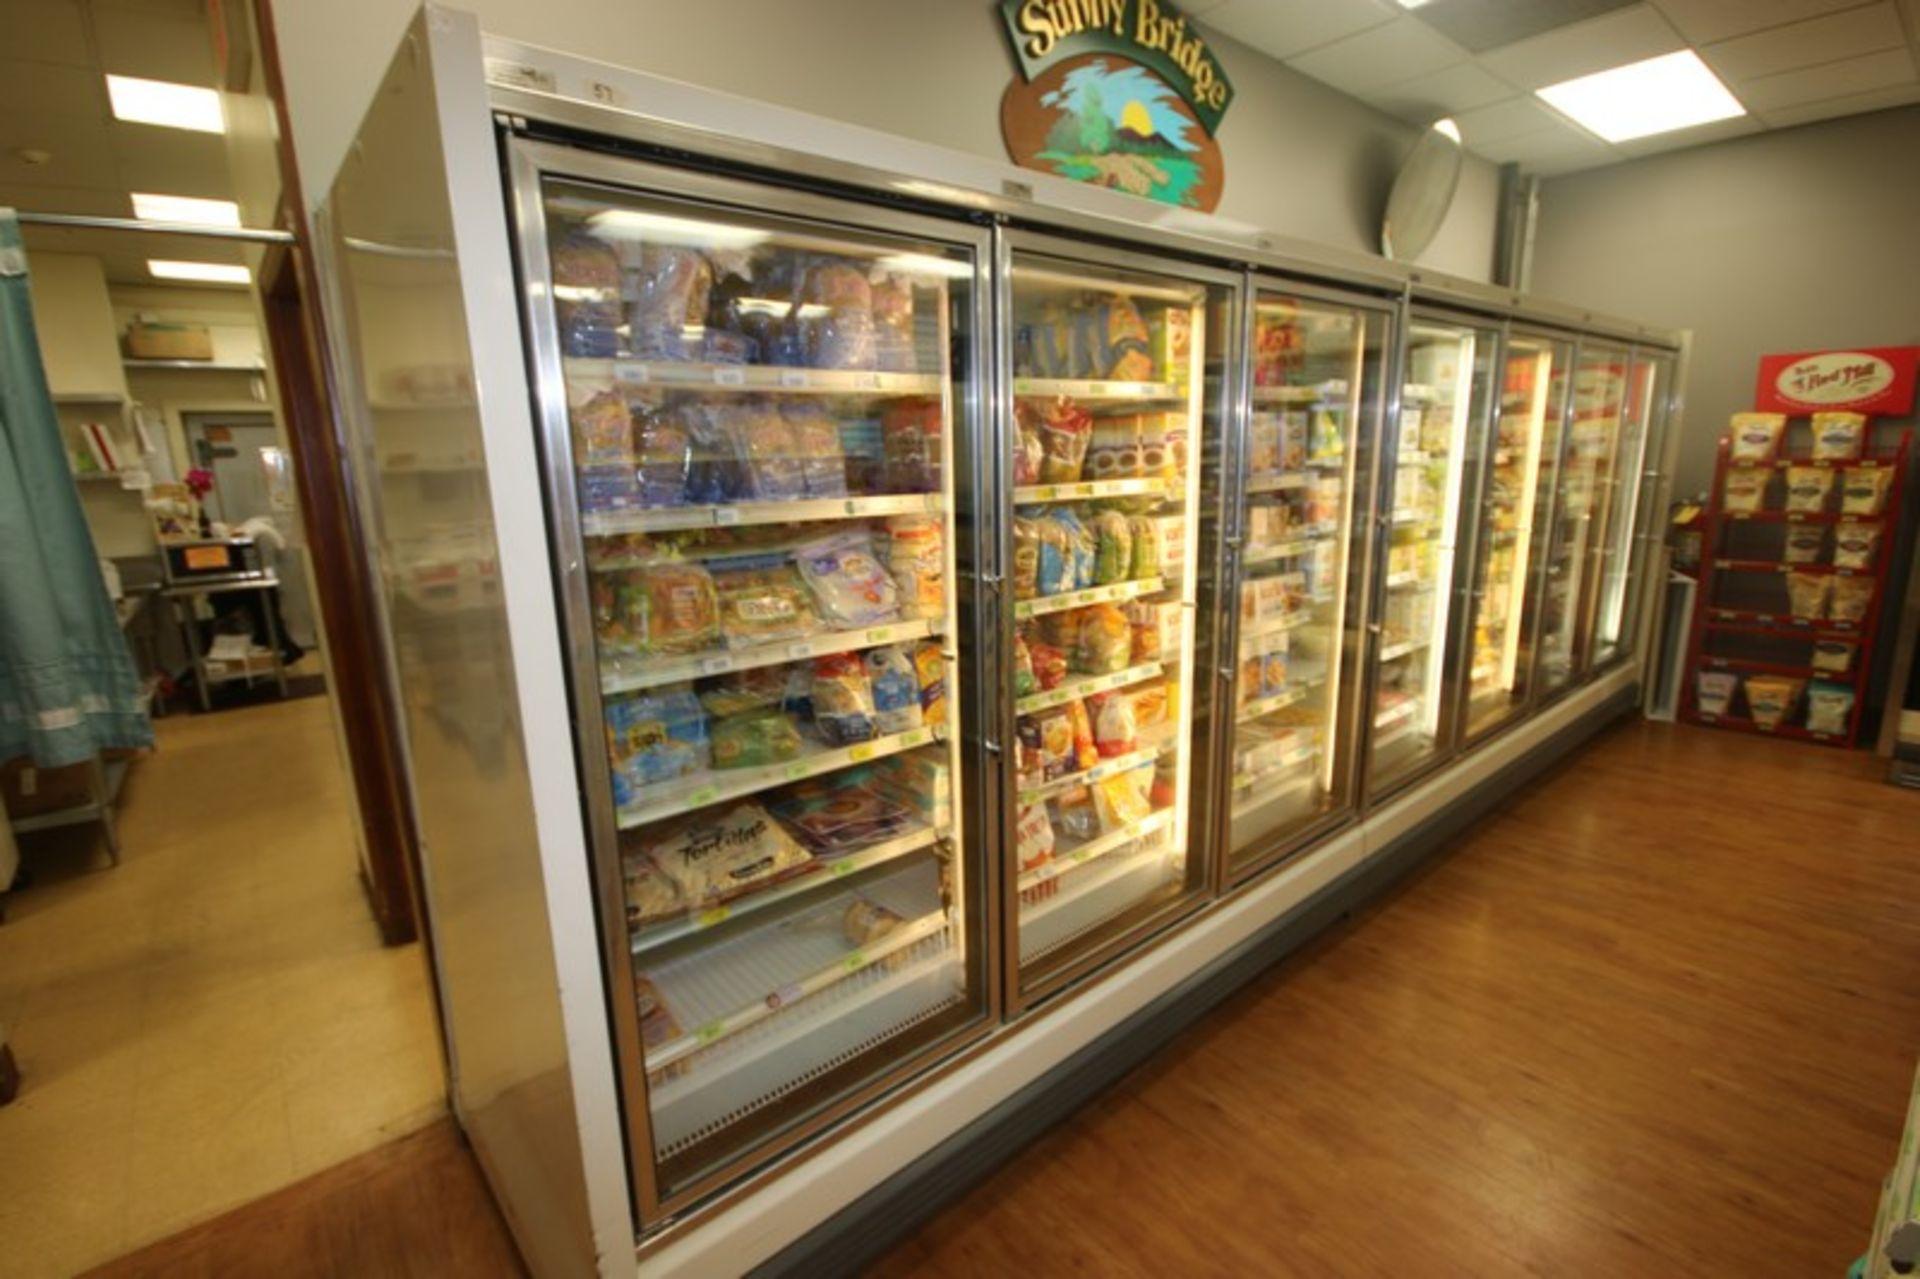 Hussman 3-Door Refrigeration Unit, M/N GEL-3, S/N 02BO1278-350, 115/208-230 Volts, 1 Phase, - Image 3 of 4